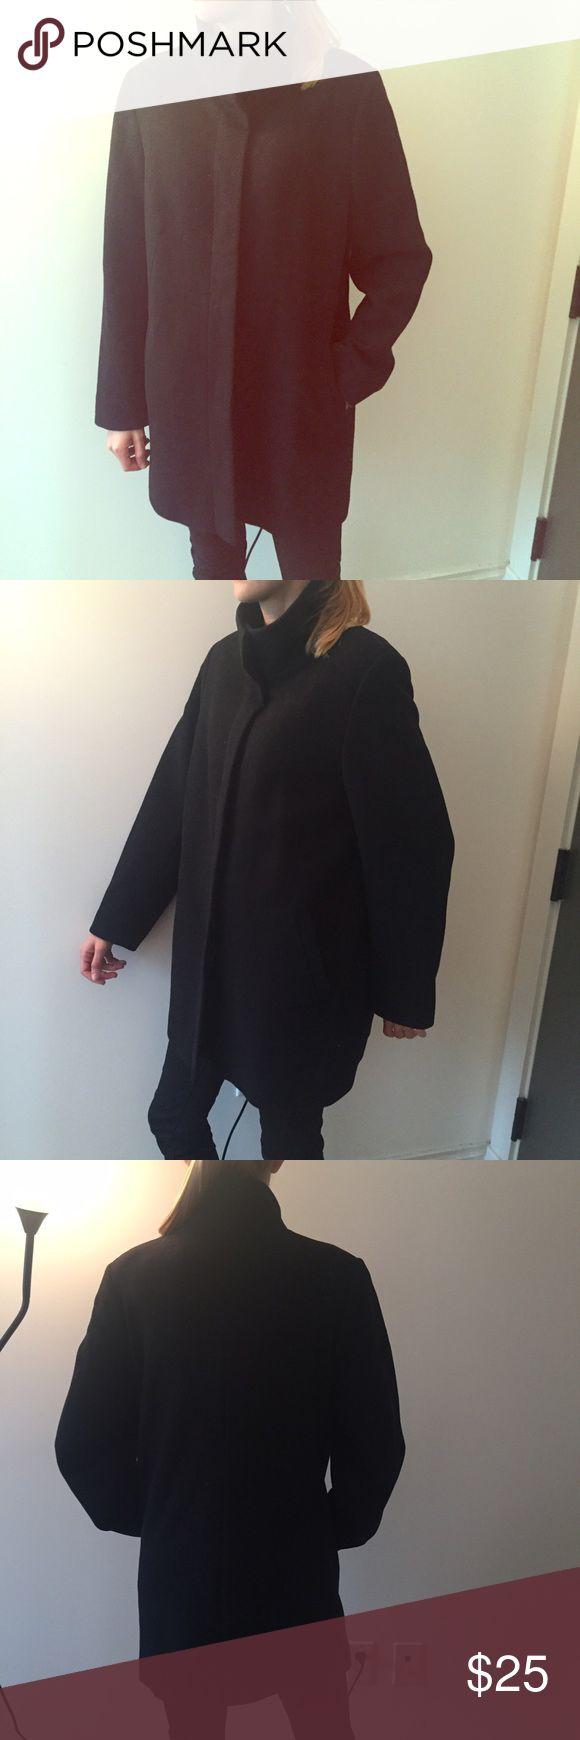 Wool warm winter coat Very good quality square shape wool winter coat Marks & Spencers Jackets & Coats Pea Coats